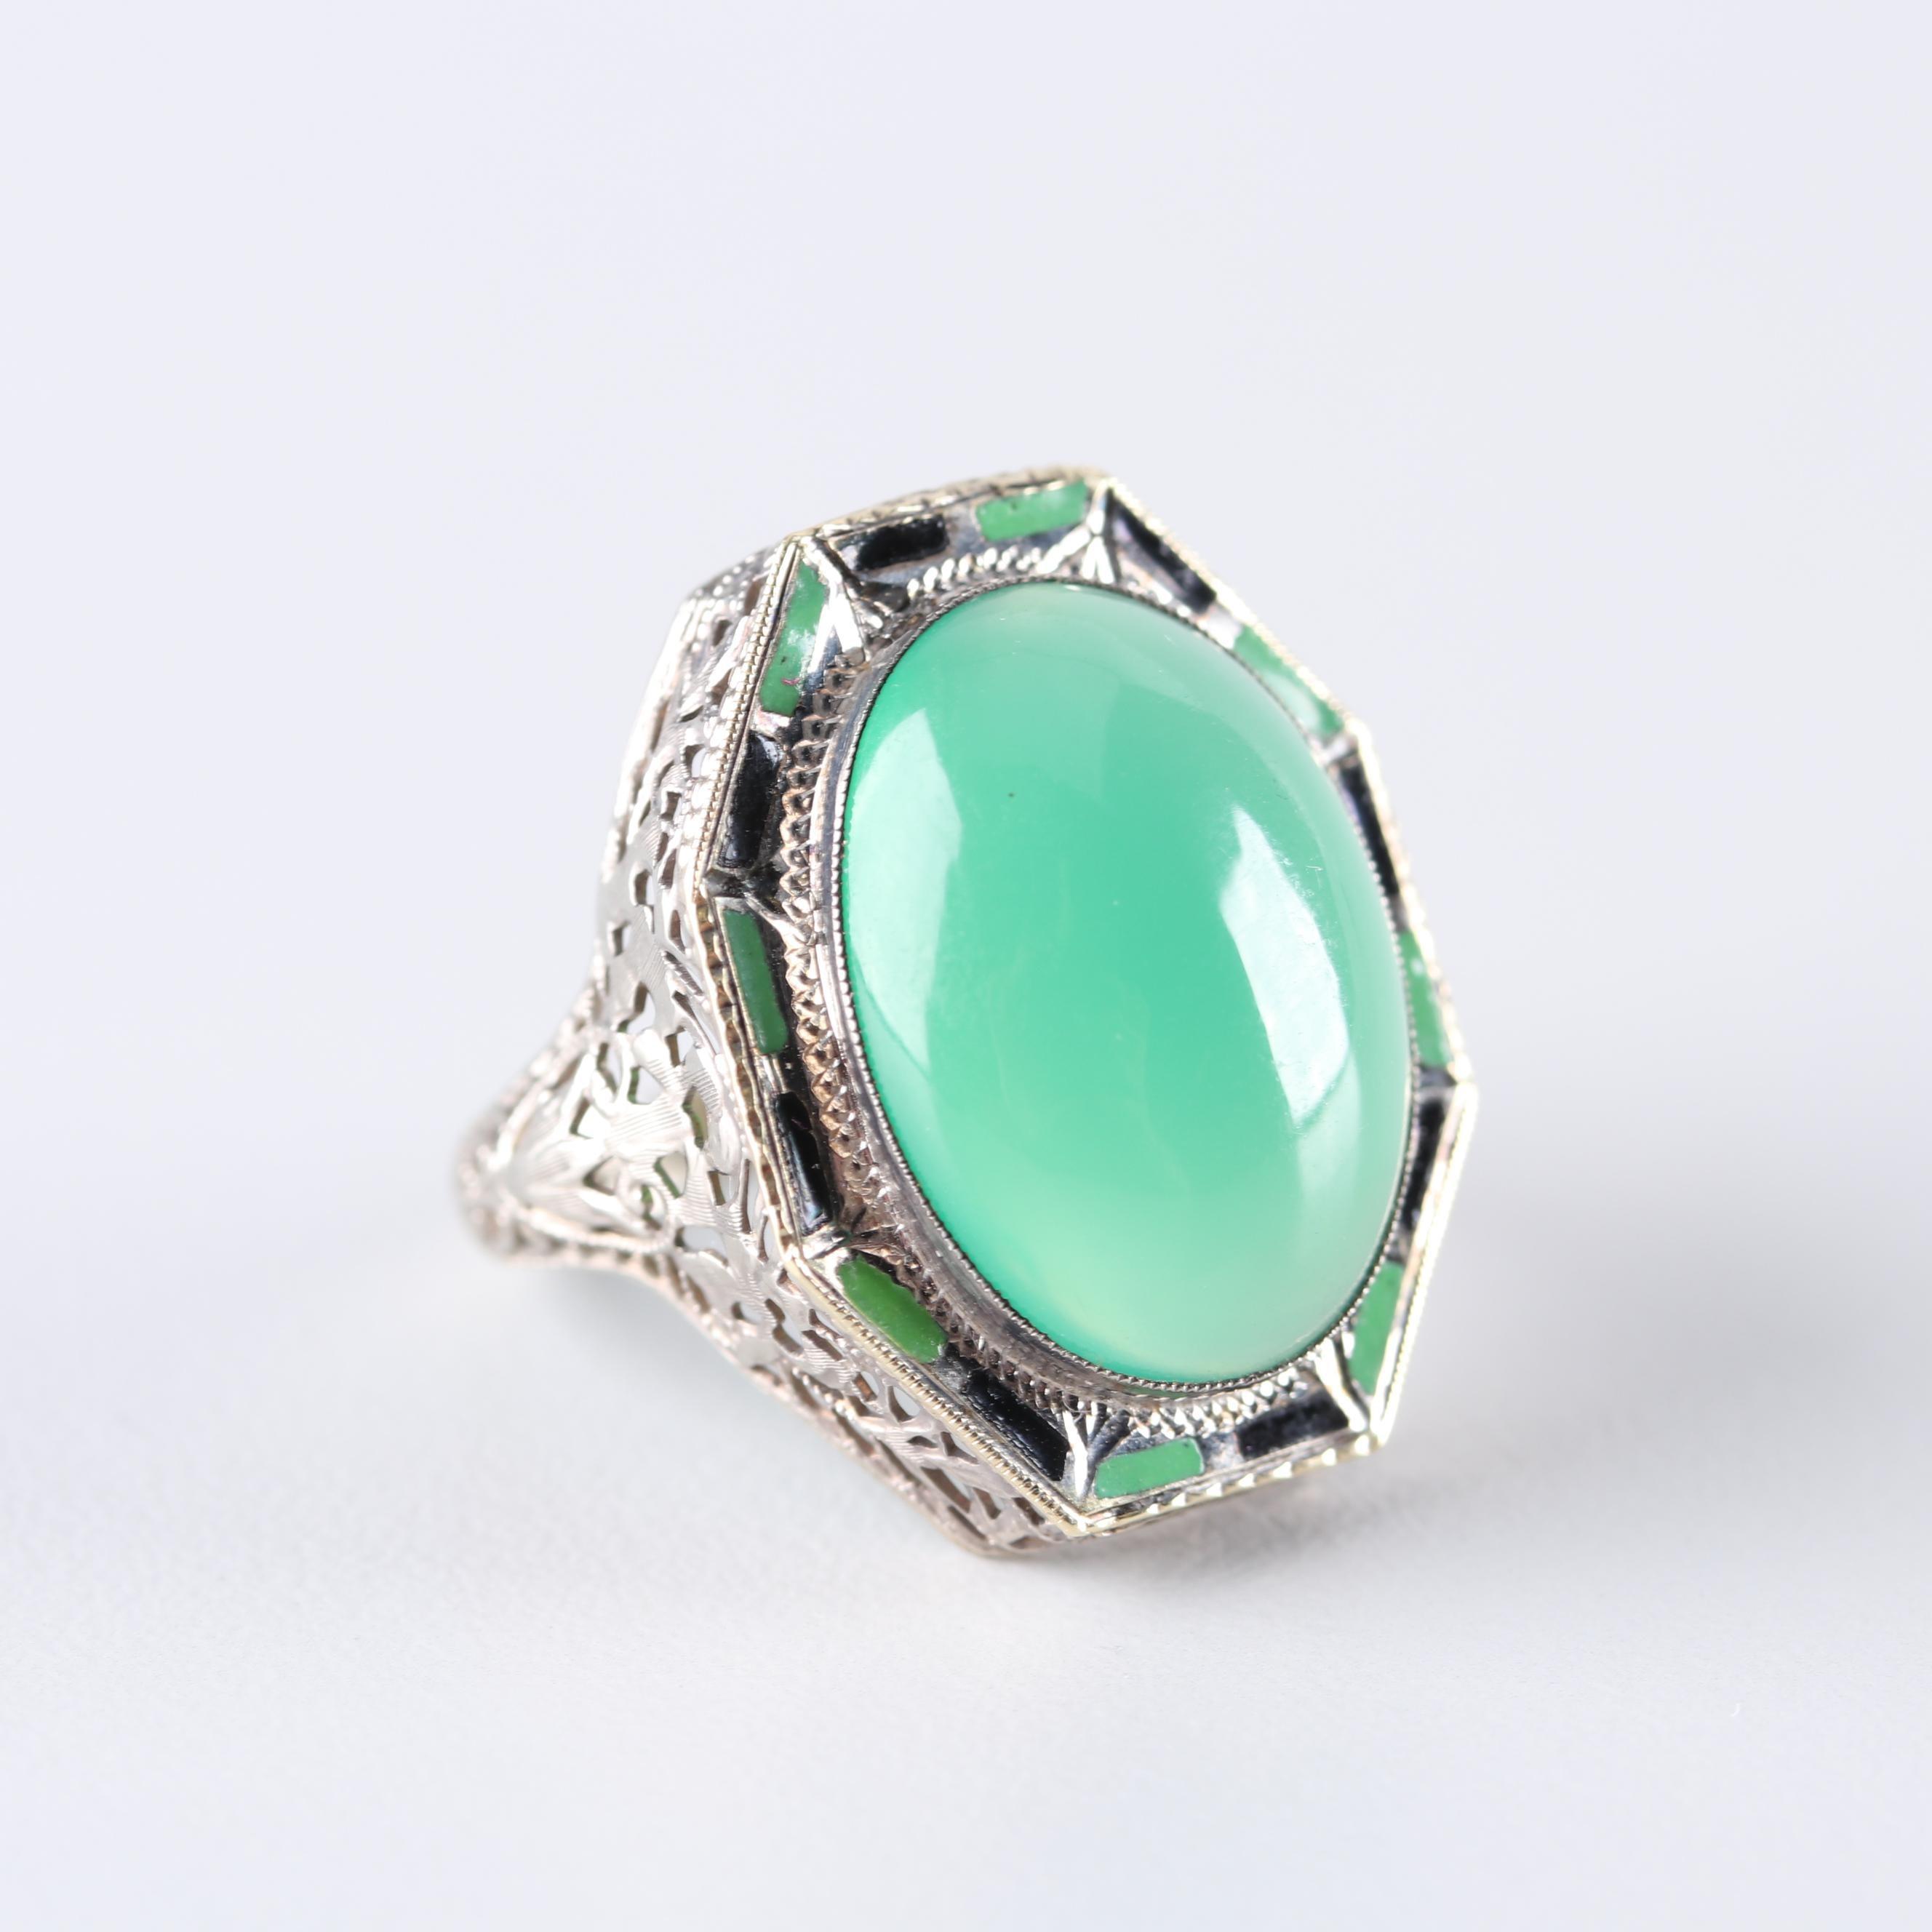 Edwardian 14K White Gold Chrysoprase Ring